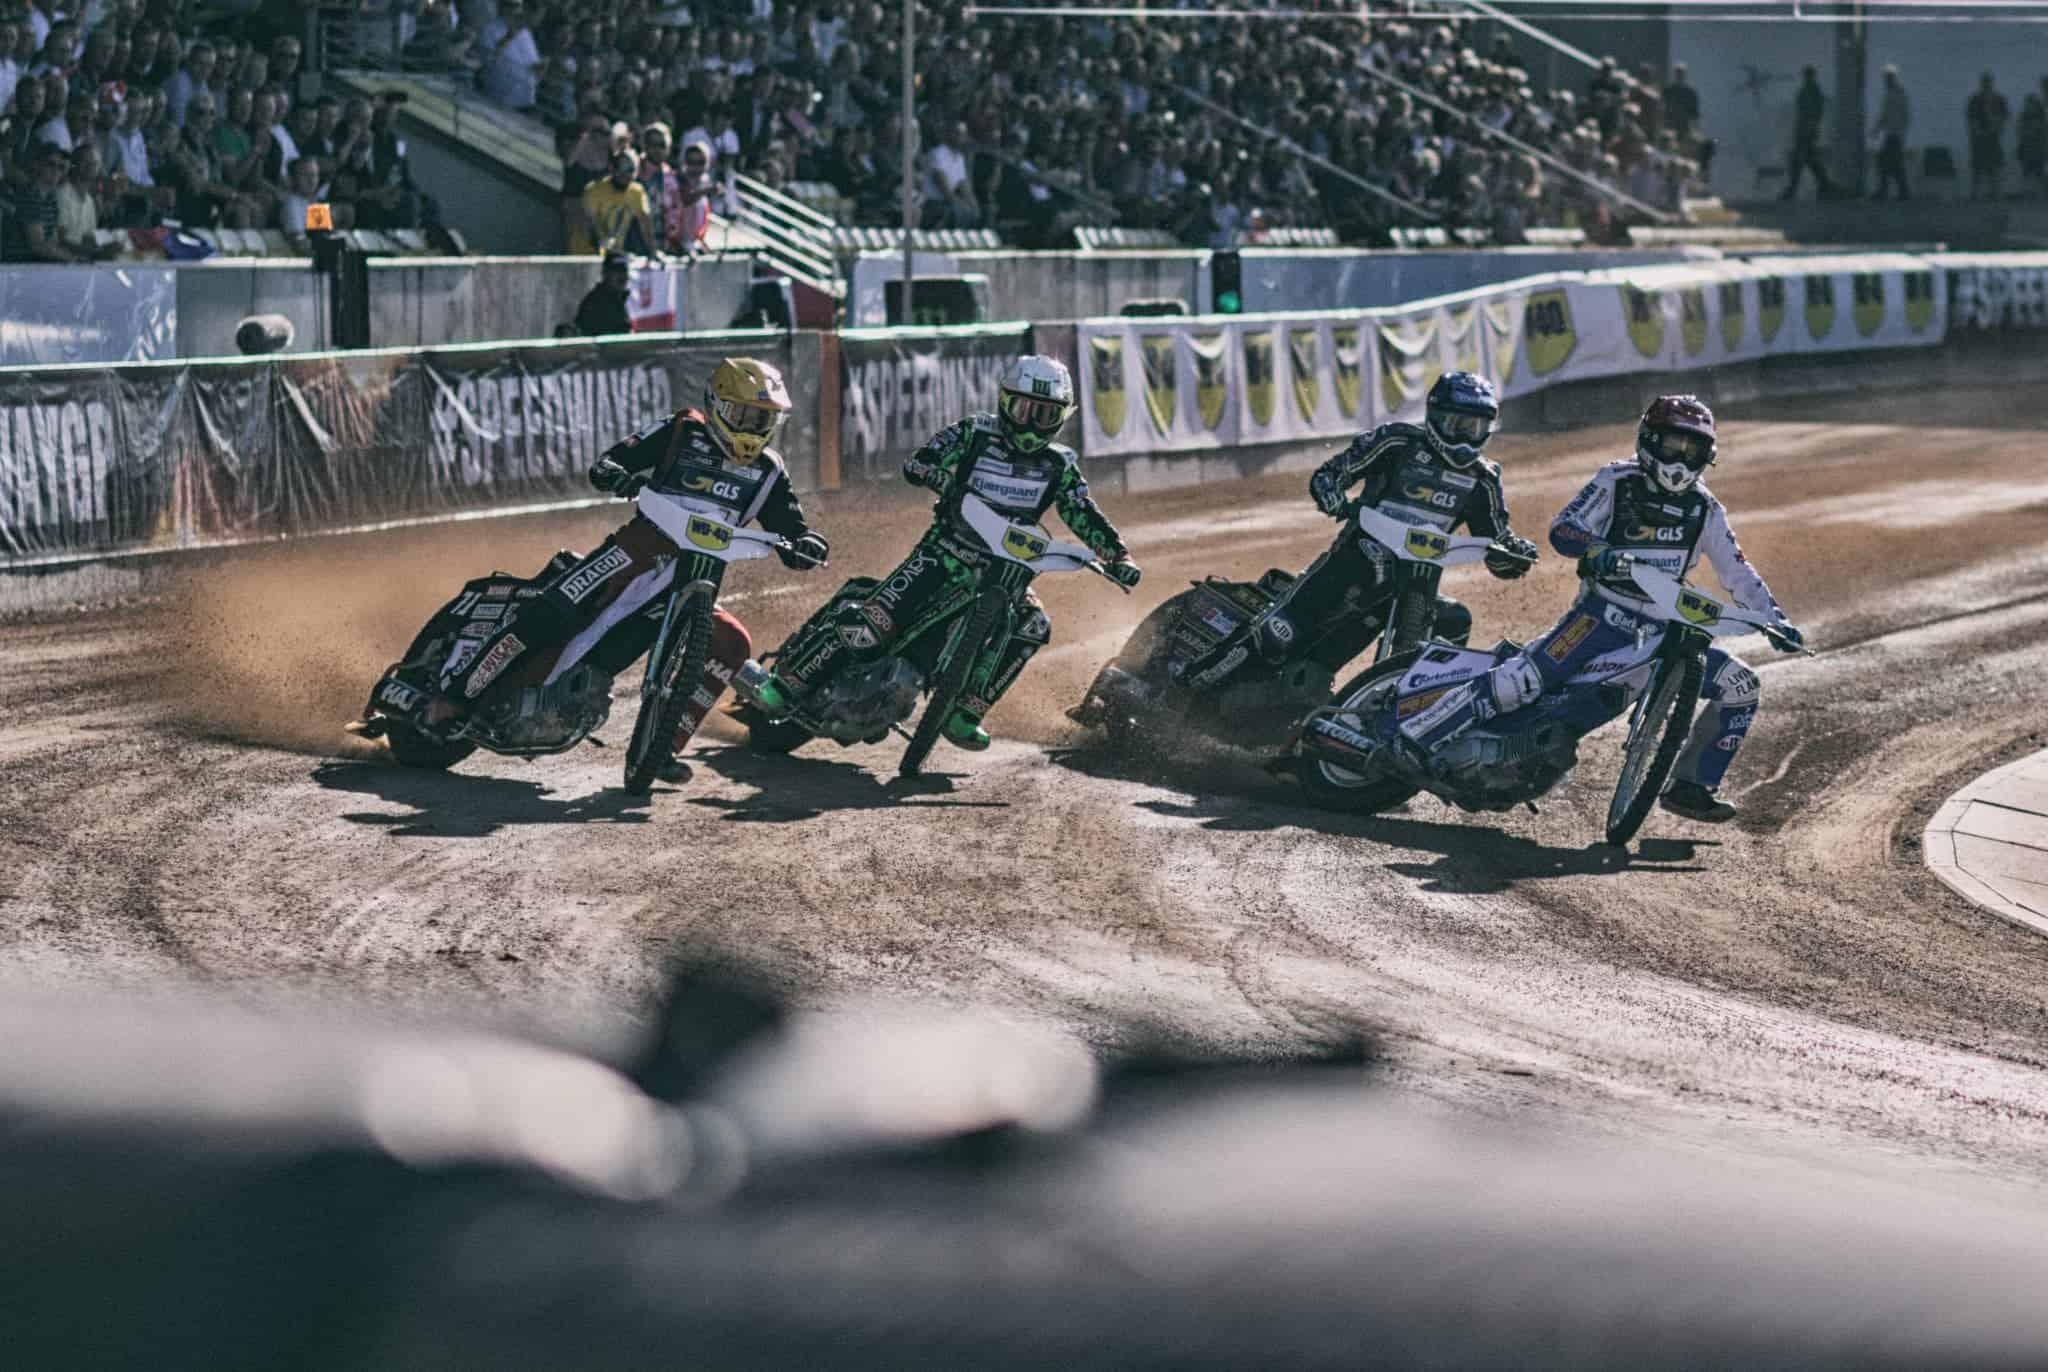 2018 FIM Speedway Grand Prix